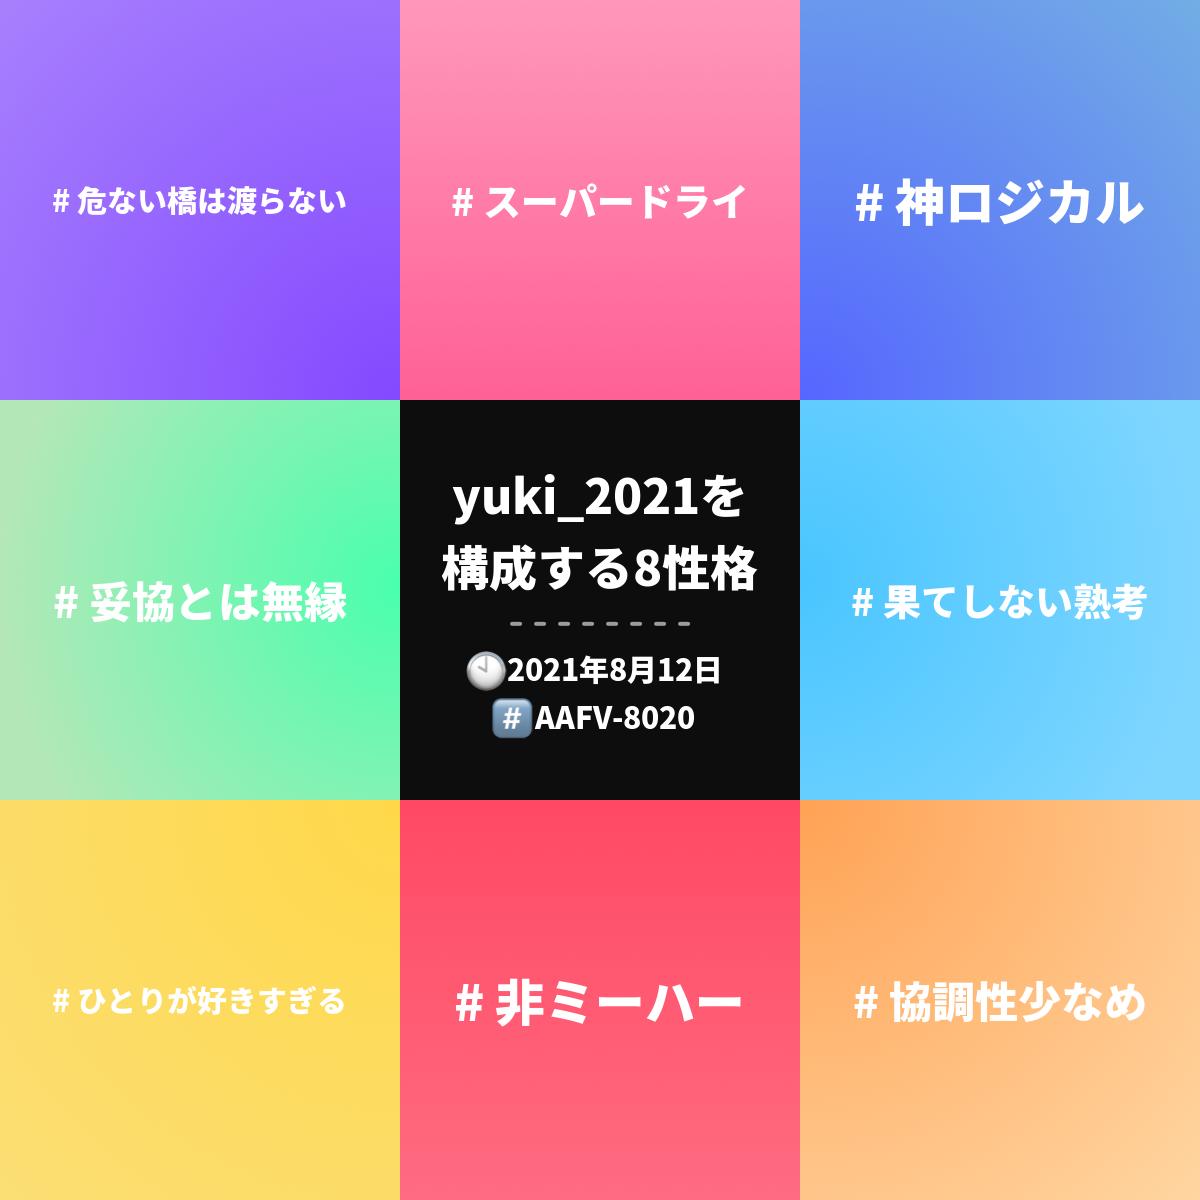 f:id:yuki_2021:20210812211114p:plain